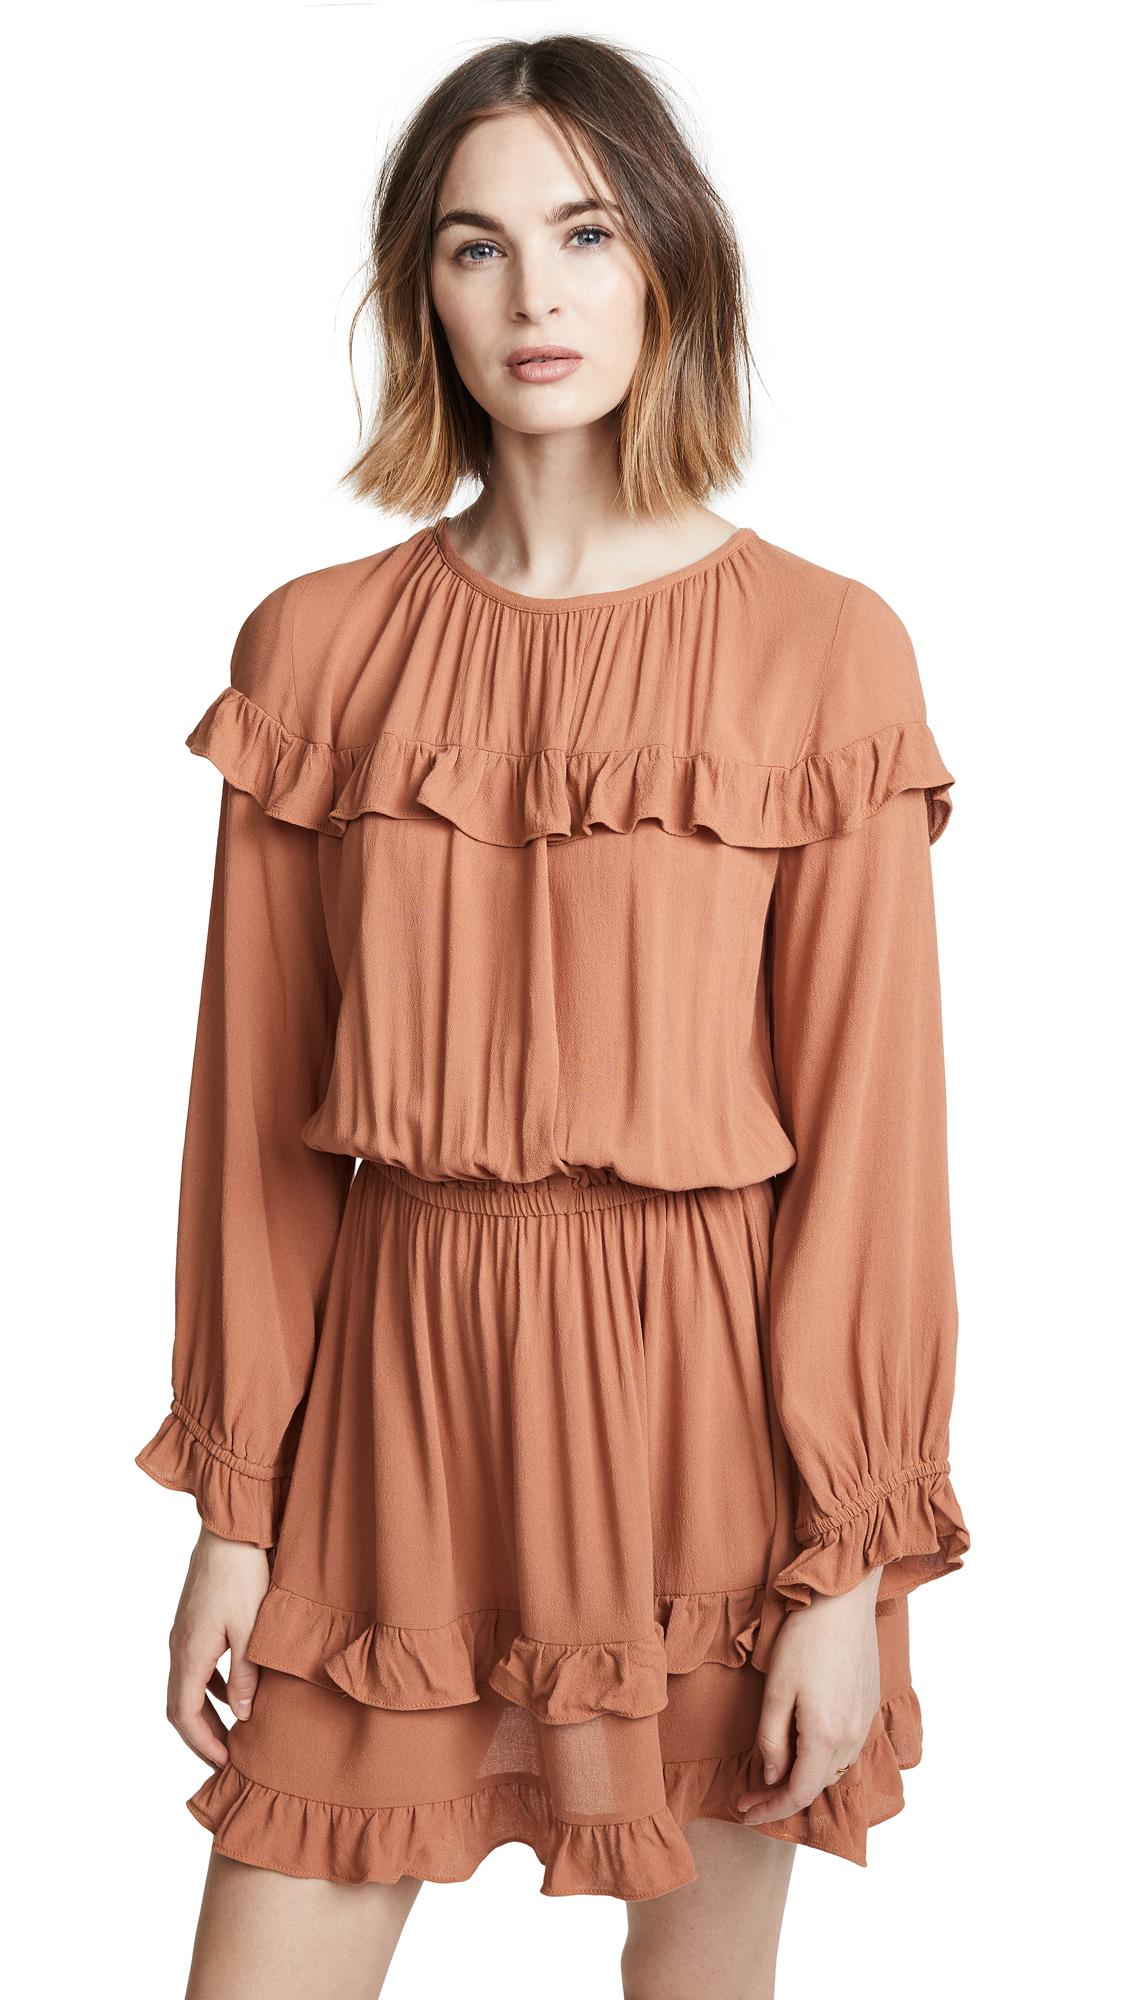 Rachel Pally Crepe Maeve Dress In Terra Cotta